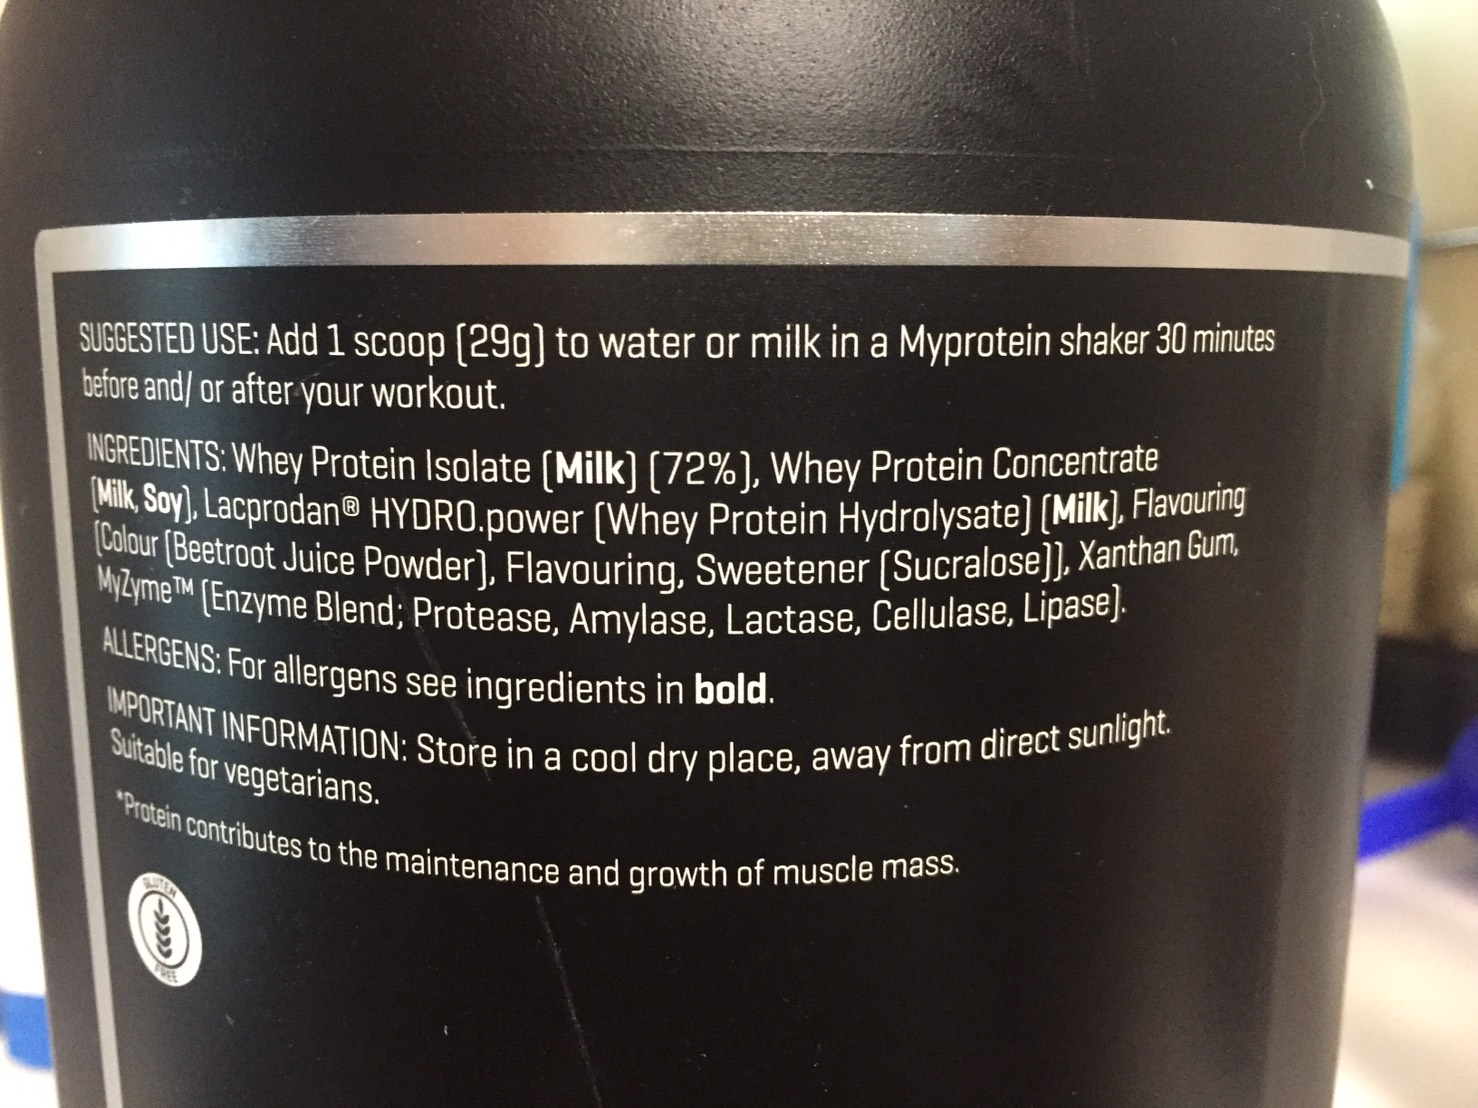 「THEWHEY」のSTRAWBERRY MILKSHAKE FALVOUR(ストロベリーミルクシェイク味)の成分表